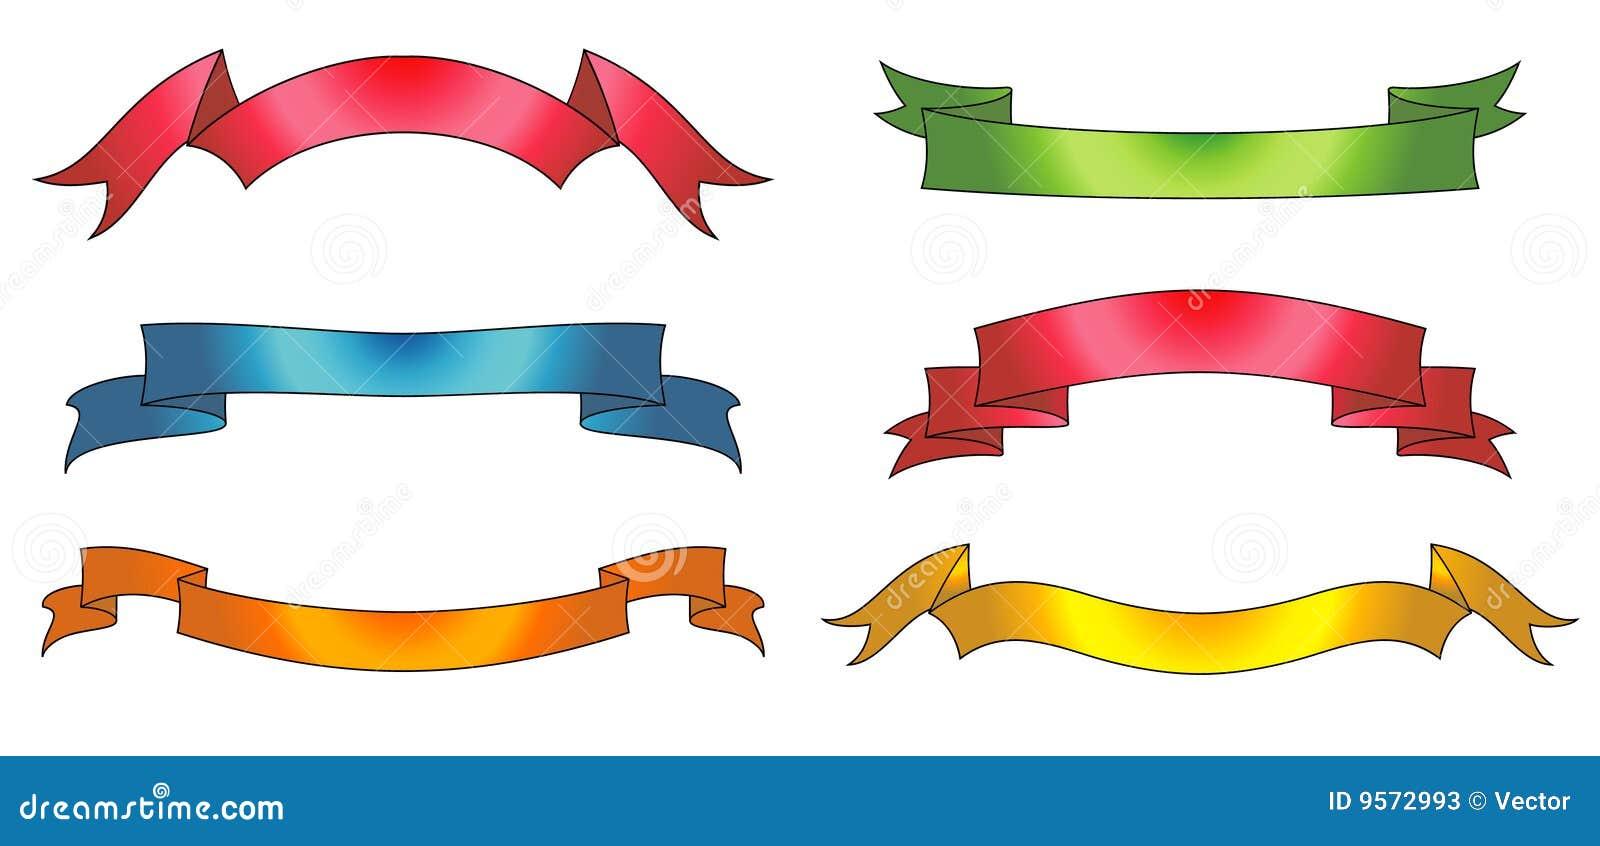 vector ribbons stock vector image of elegant image blank 9572993